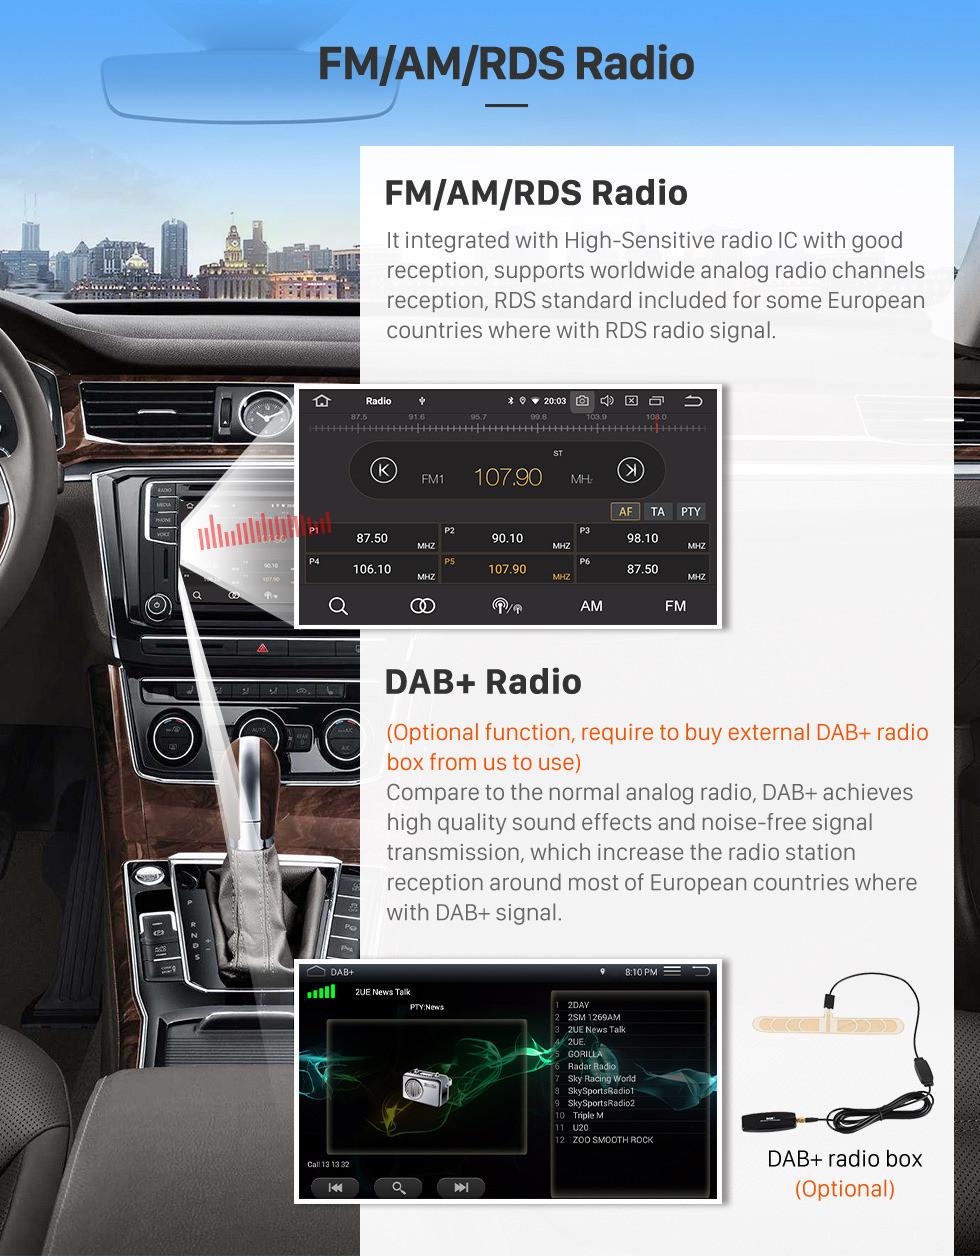 Seicane 2005 2006 2007 2008-2012 BMW 3 серии E90 E91 E92 E93 Ручной Air Android 9.0 Bluetooth Радио DVD-плеер Головной блок Поддержка GPS Navi HD Сенсорный экран Камера заднего вида WIFI USB Зеркальная связь 1080P Video